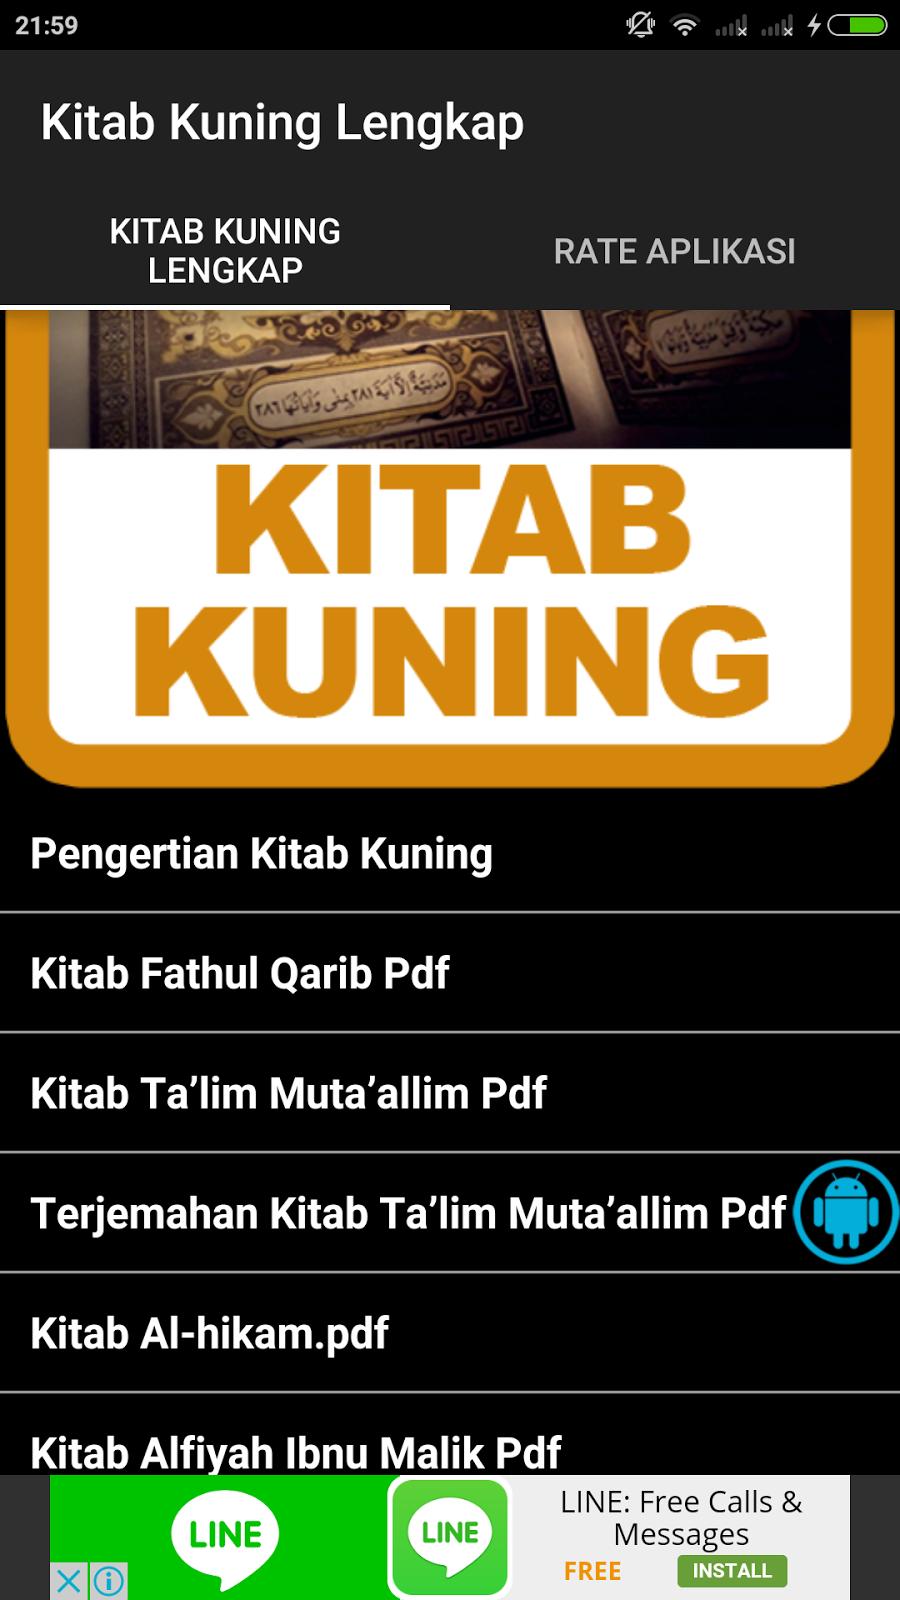 Kitab Alfiyah Ibnu Malik Pdf